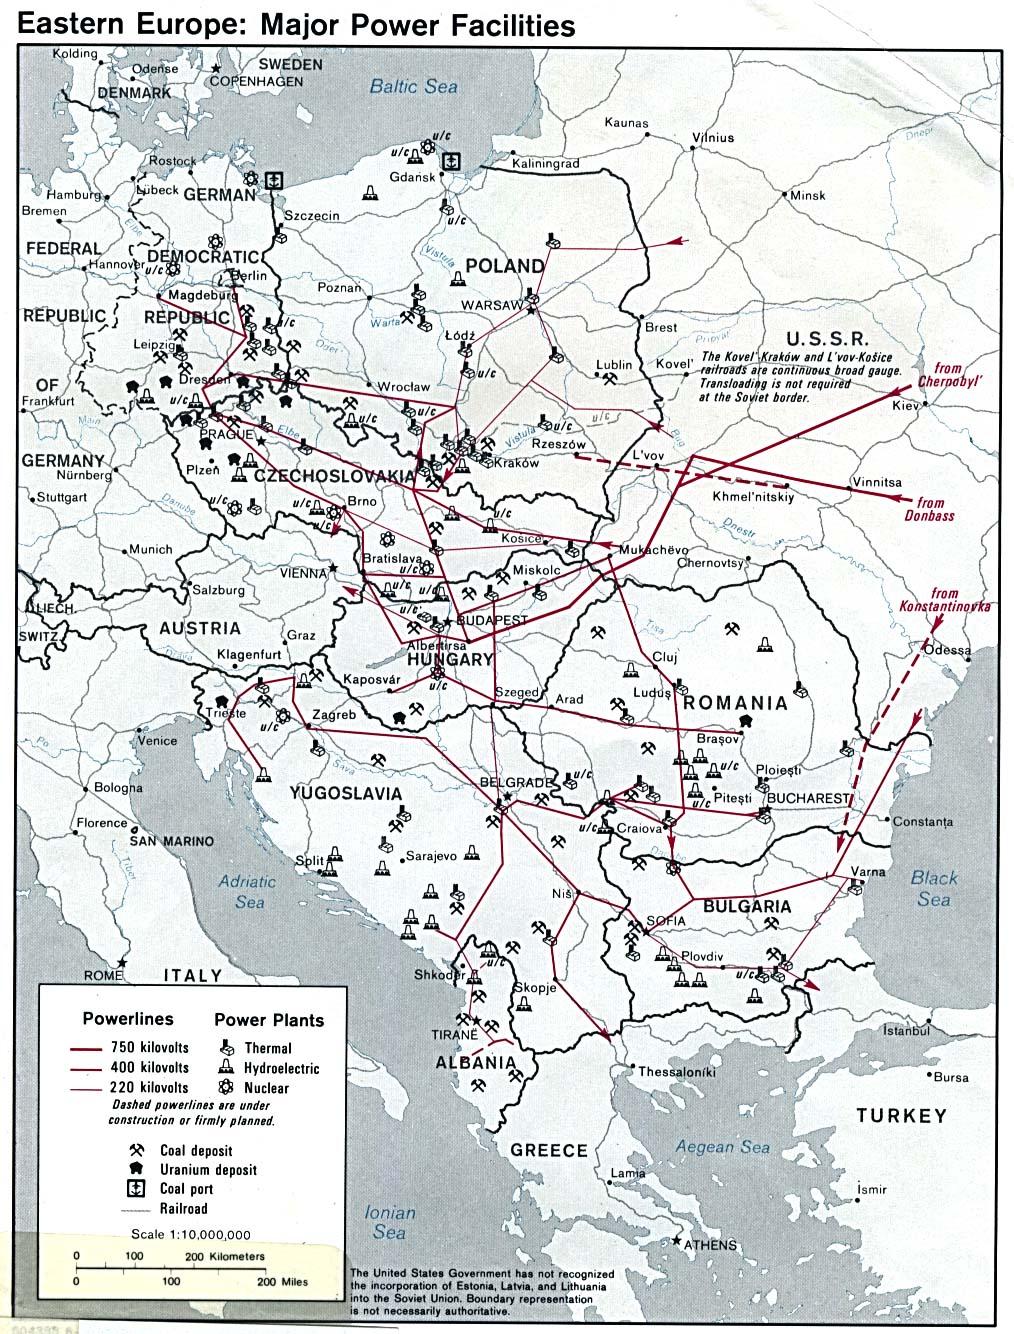 eastern europe major power facilities